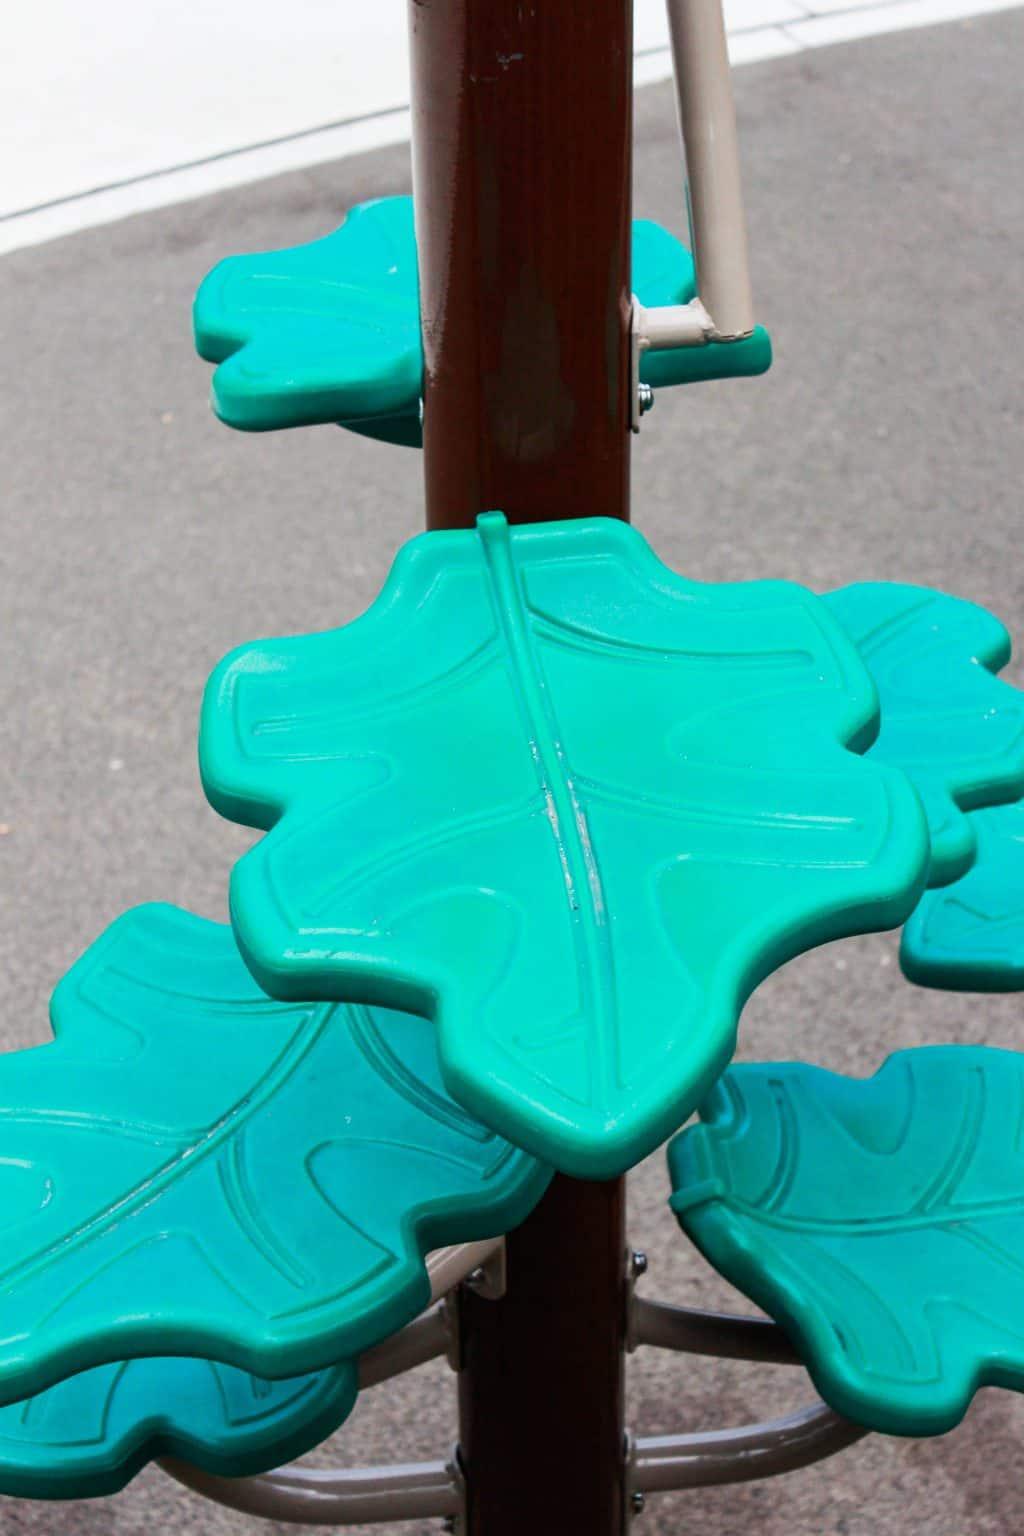 windward-beach-park-playground-brick-nj_28163000442_o-1024x1536